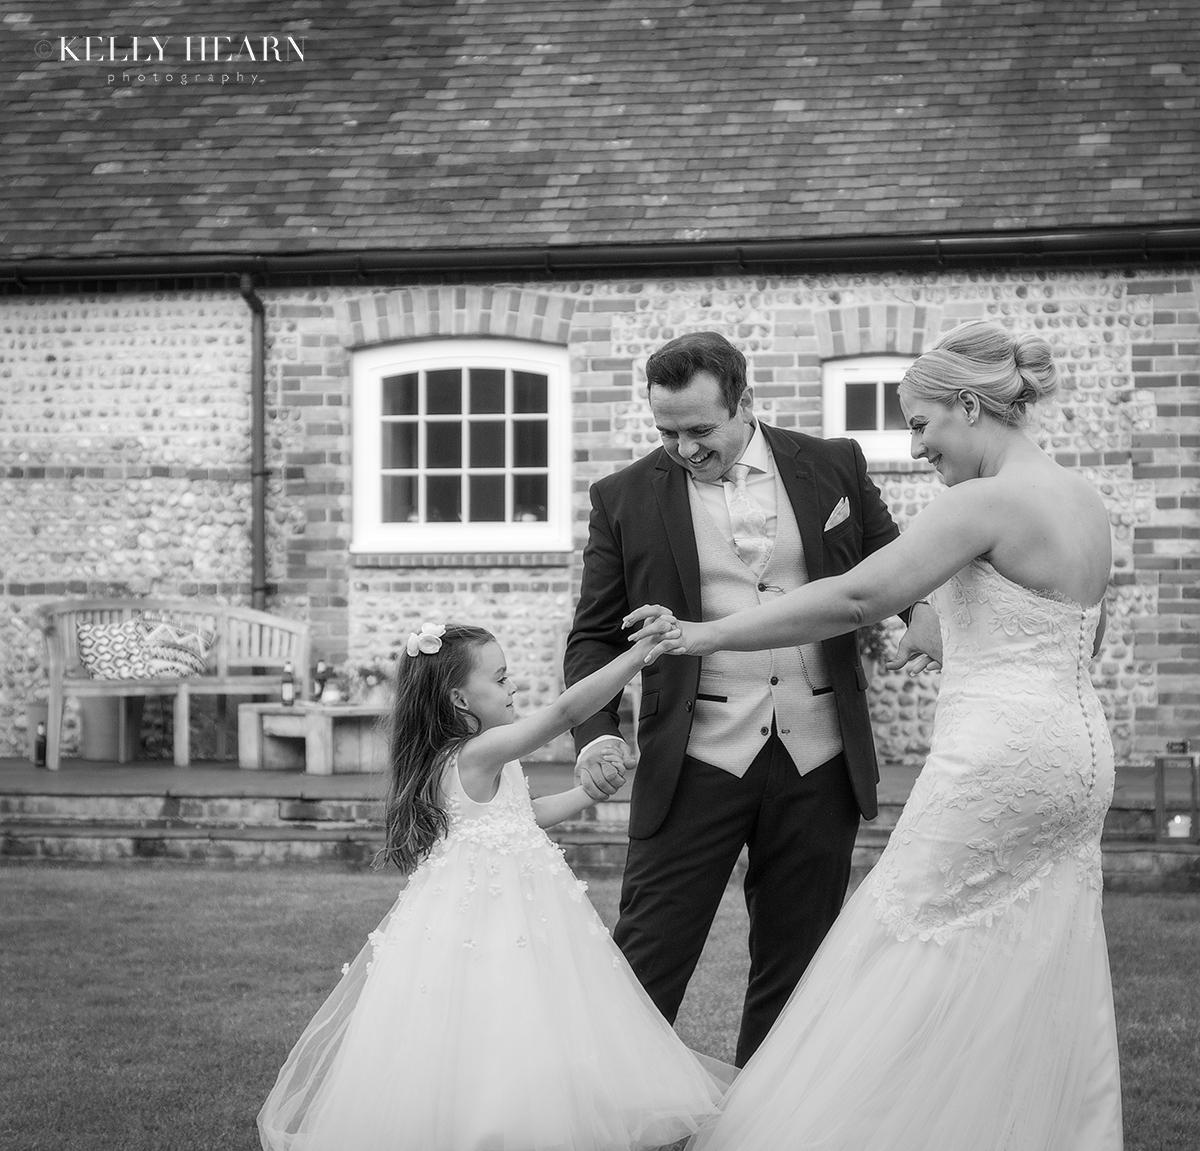 FRE_bride-groom-daughter-dance.jpg#asset:3059